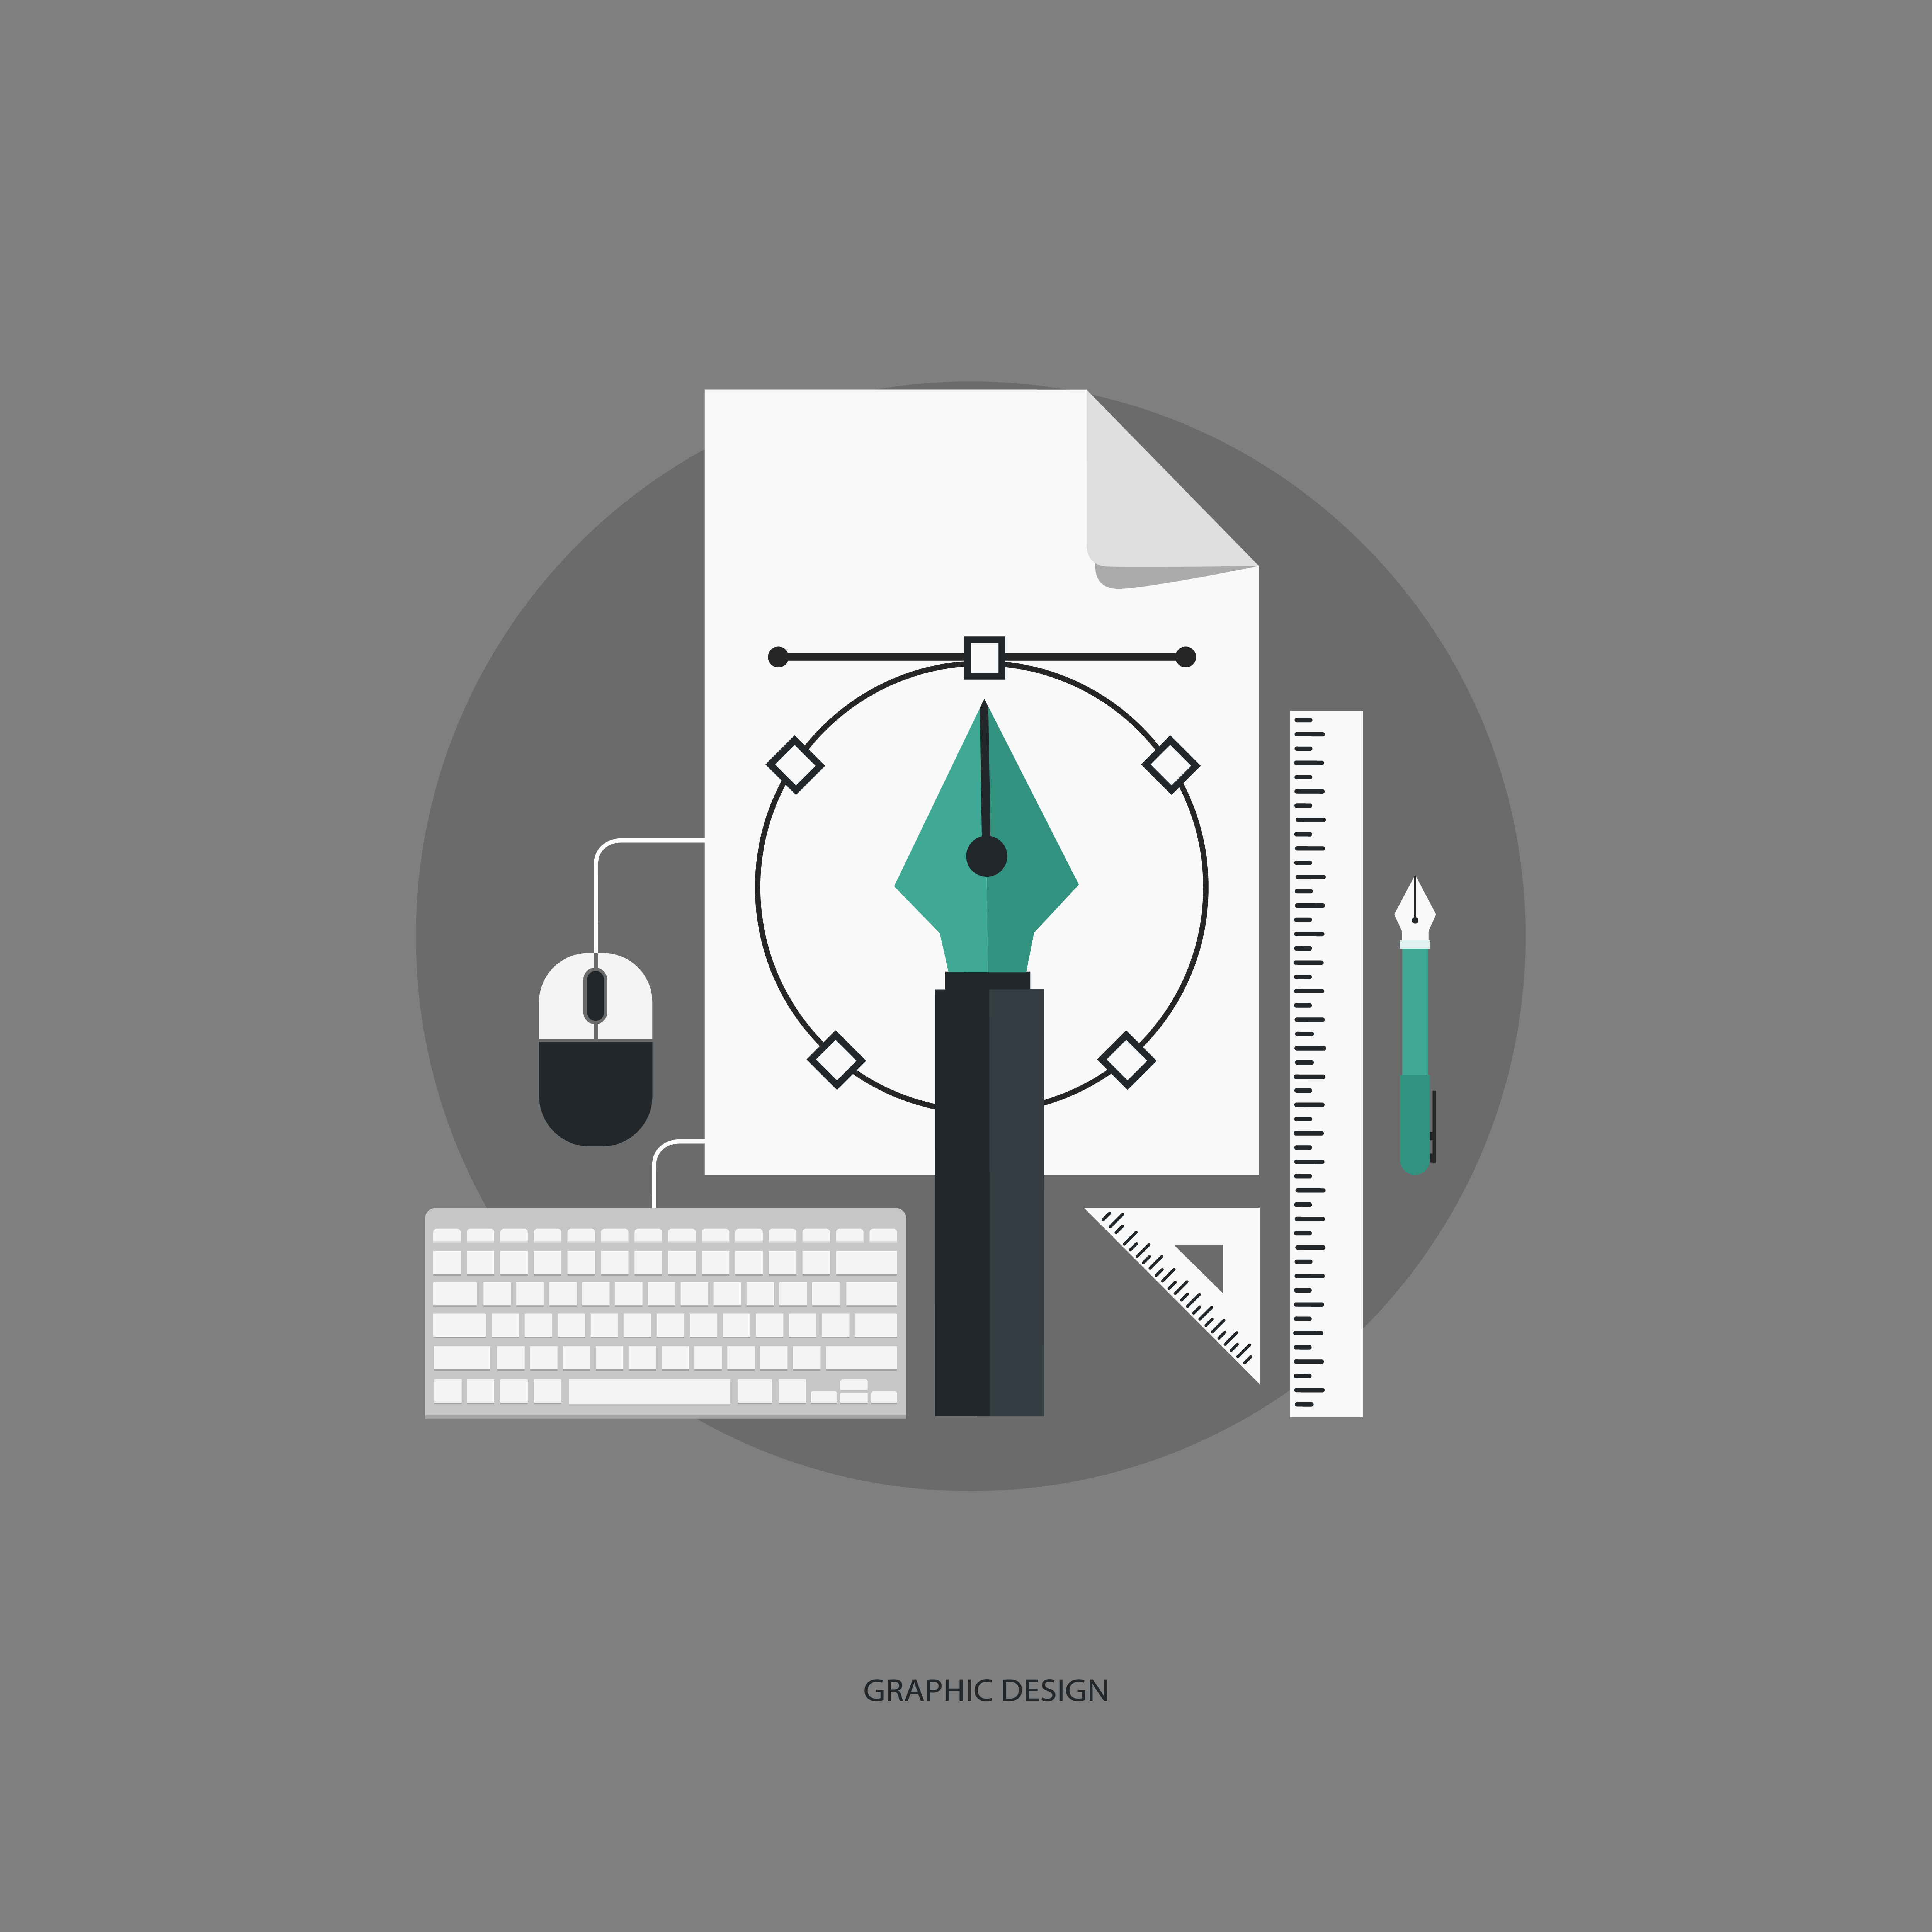 Chef de projet / Webmaster